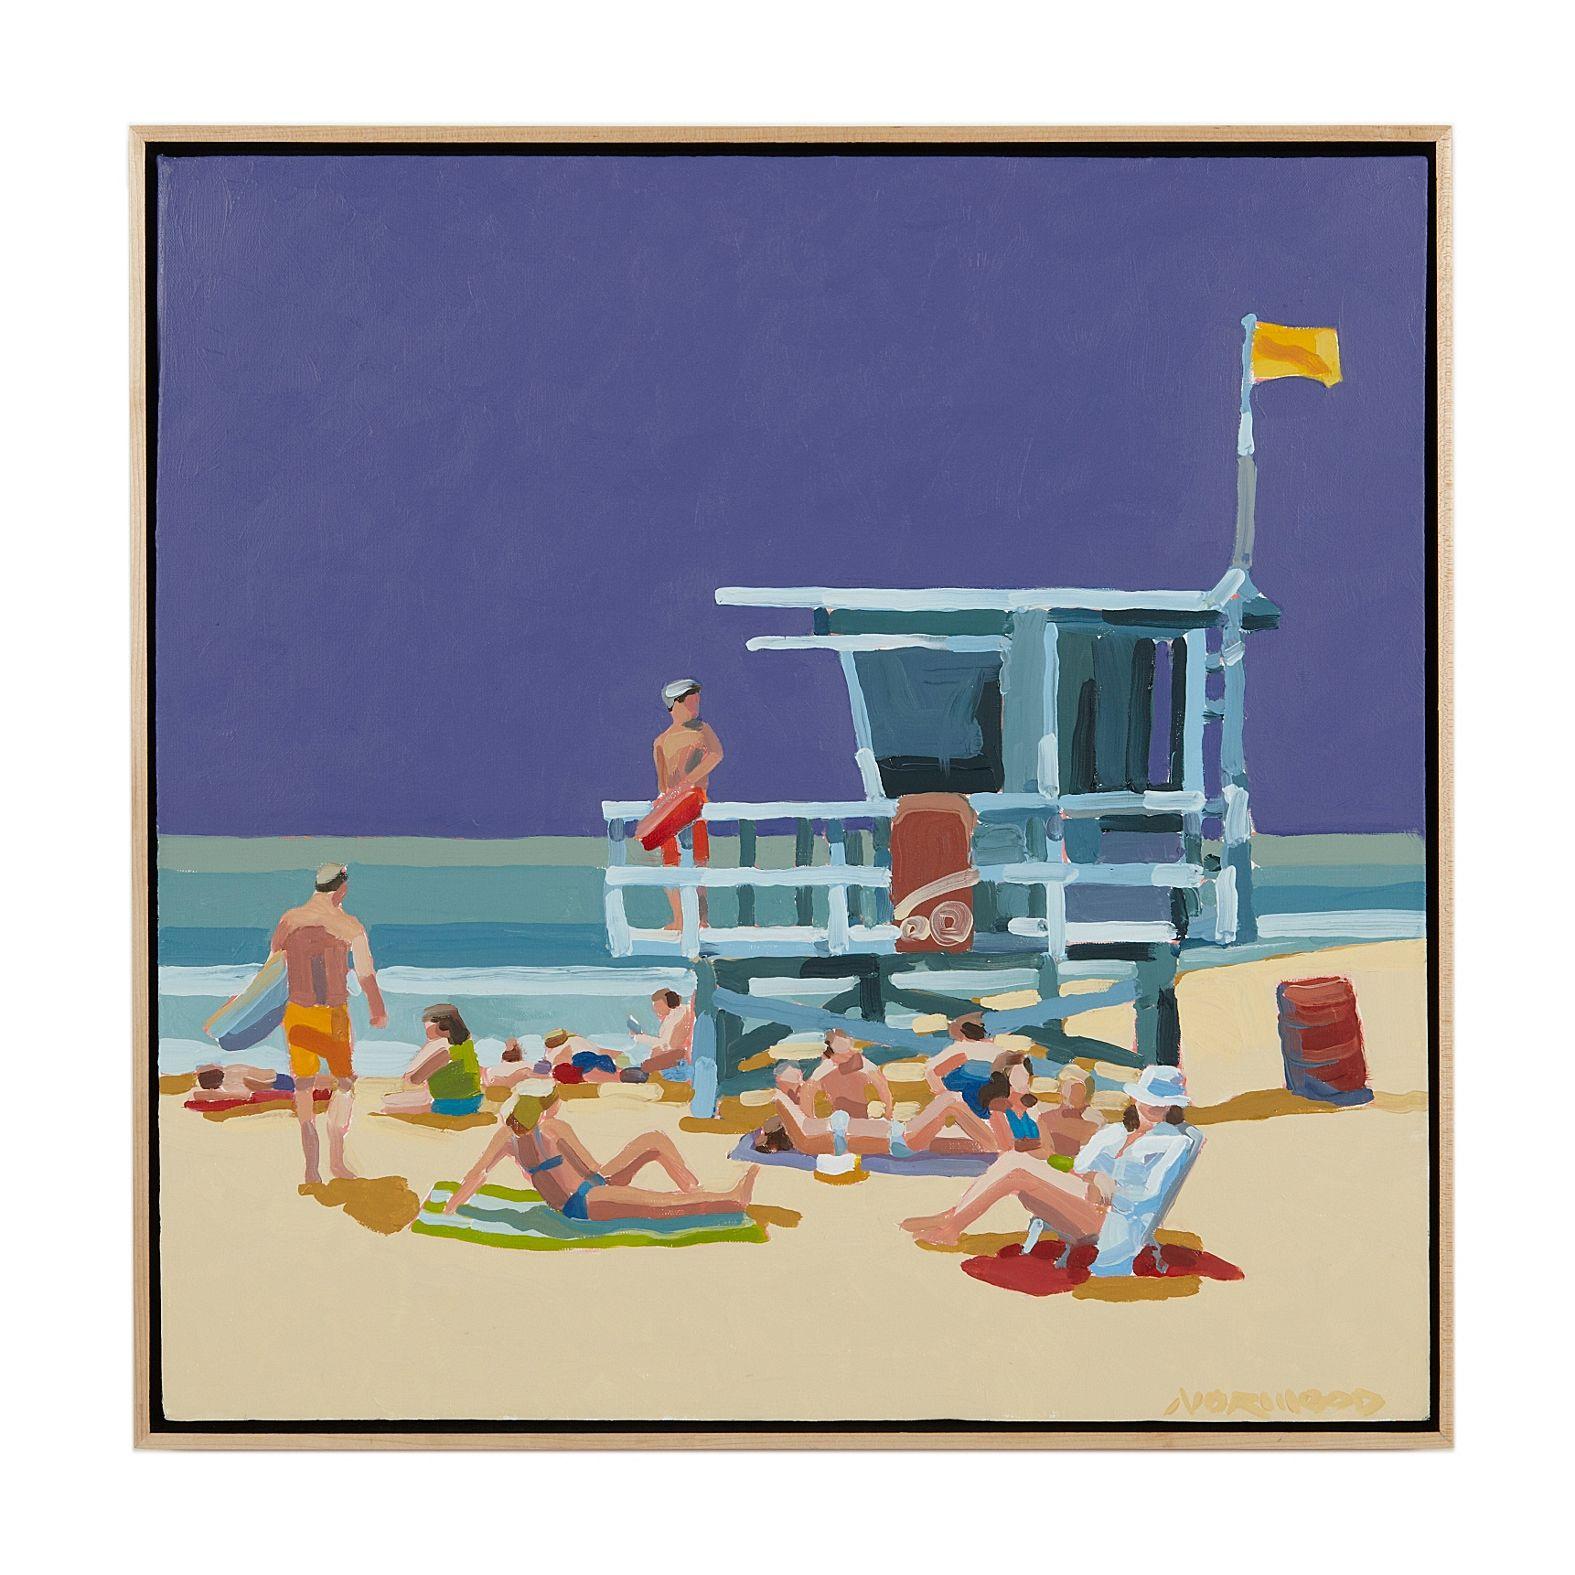 old WEYMOUTH Seaside uk Travel Antique oster print art painting large